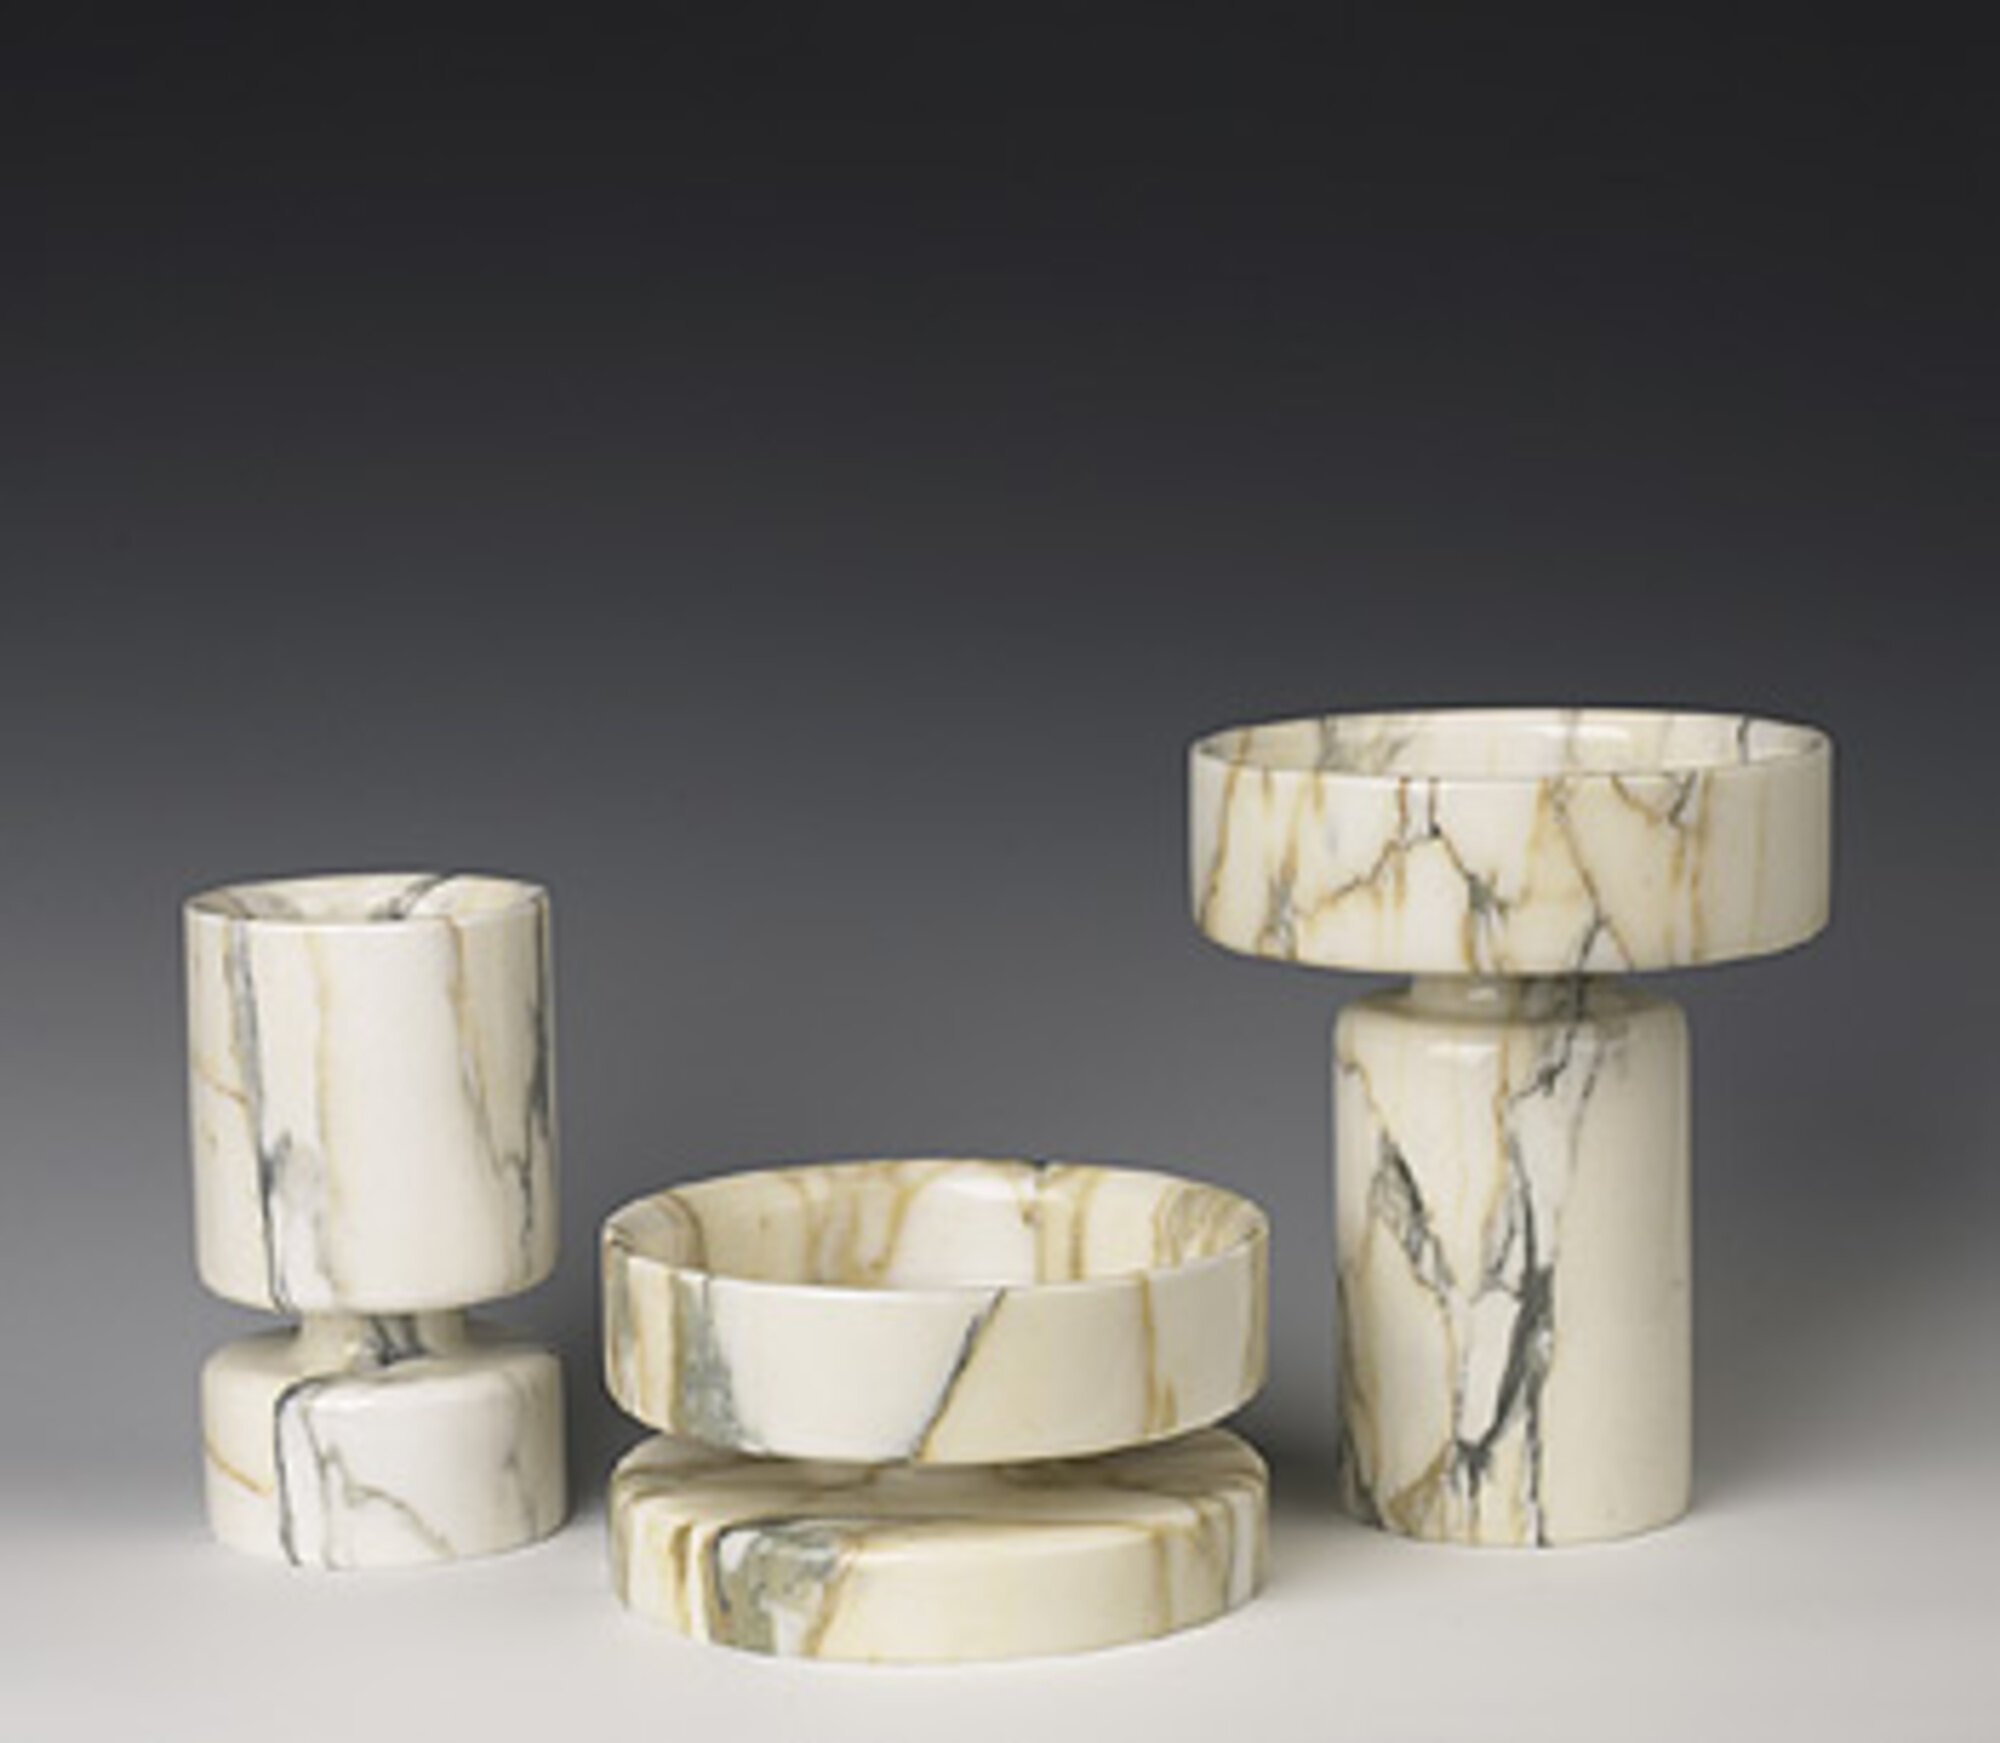 242_0_modernist_20th_century_december_2002_angelo_mangiarotti_bowls_set_of_three__wright_auction.jpg